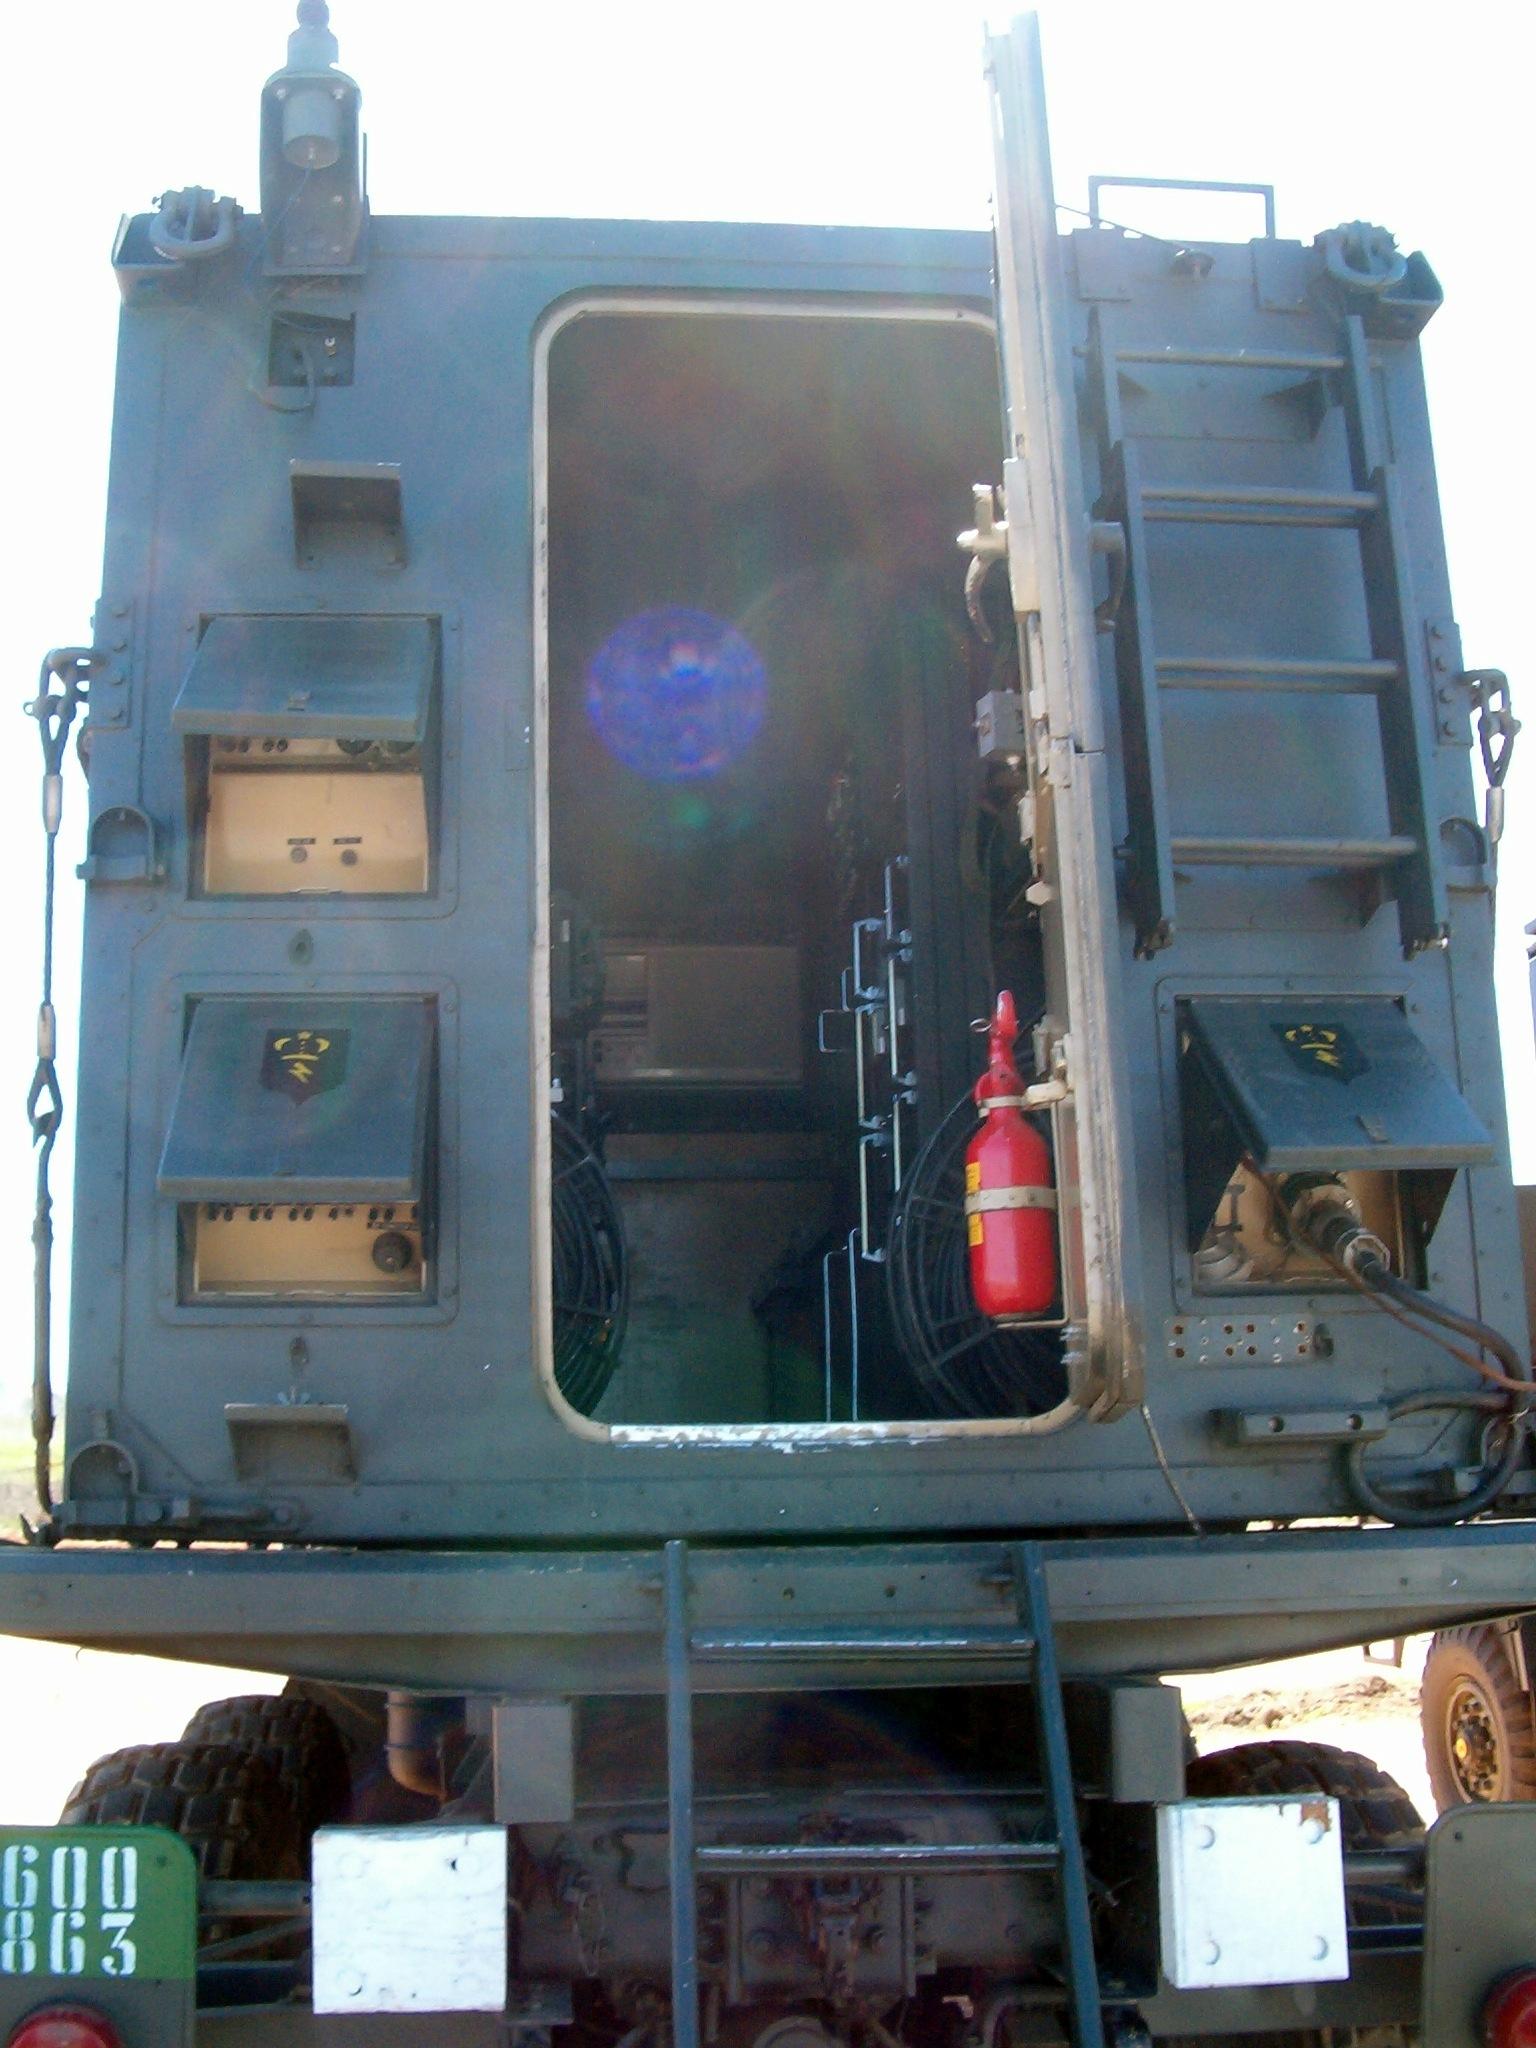 Photos - Logistique et Camions / Logistics and Trucks - Page 7 Clipbo29